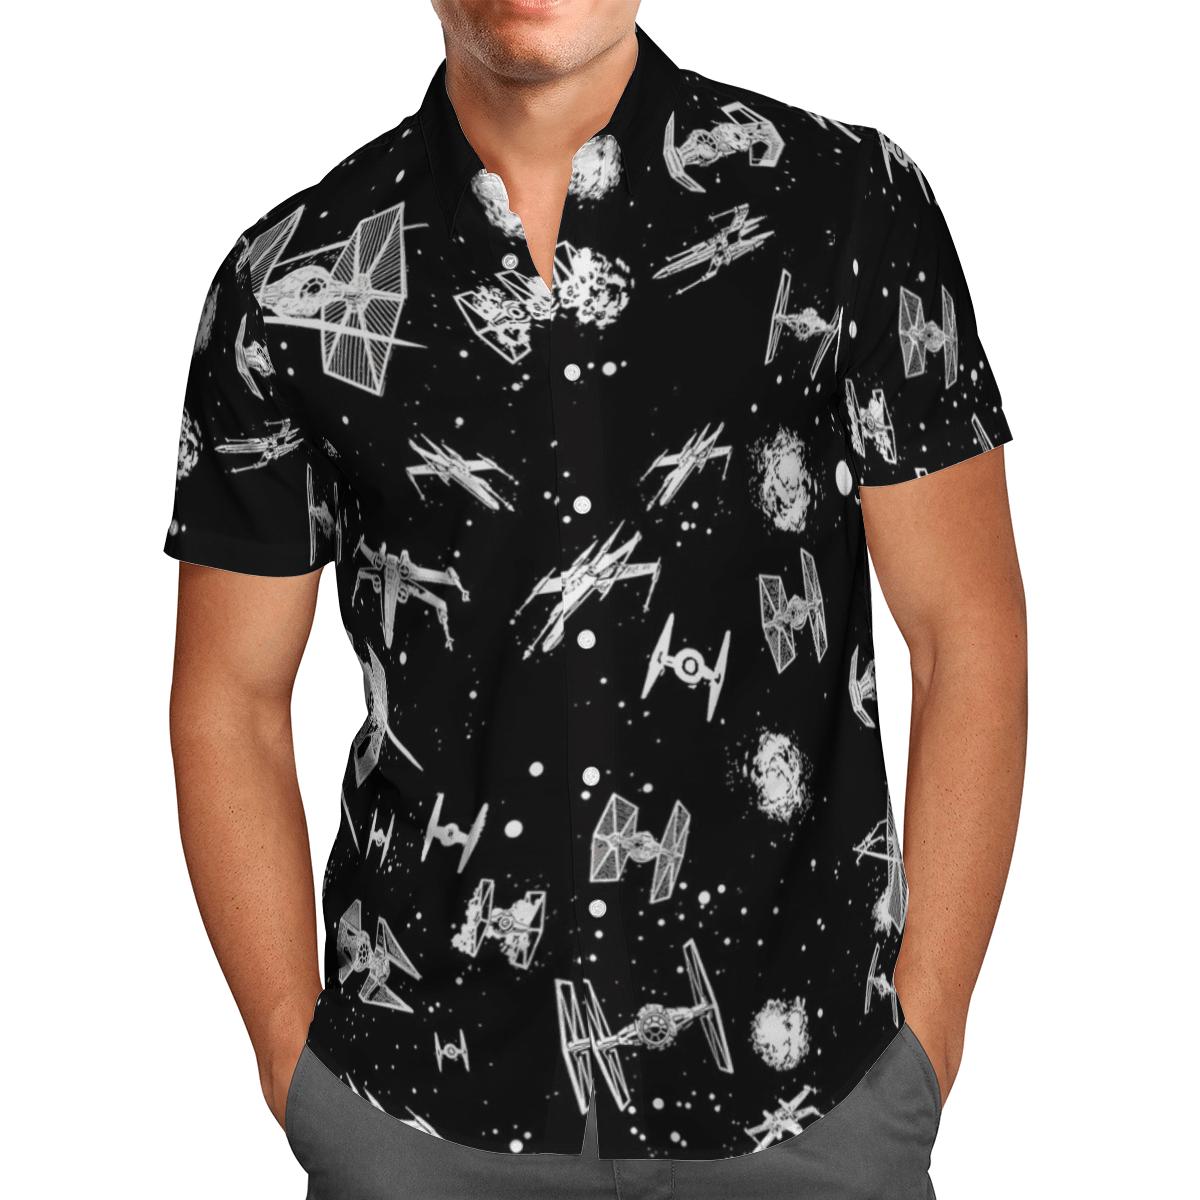 Space ships Hawaiian shirt